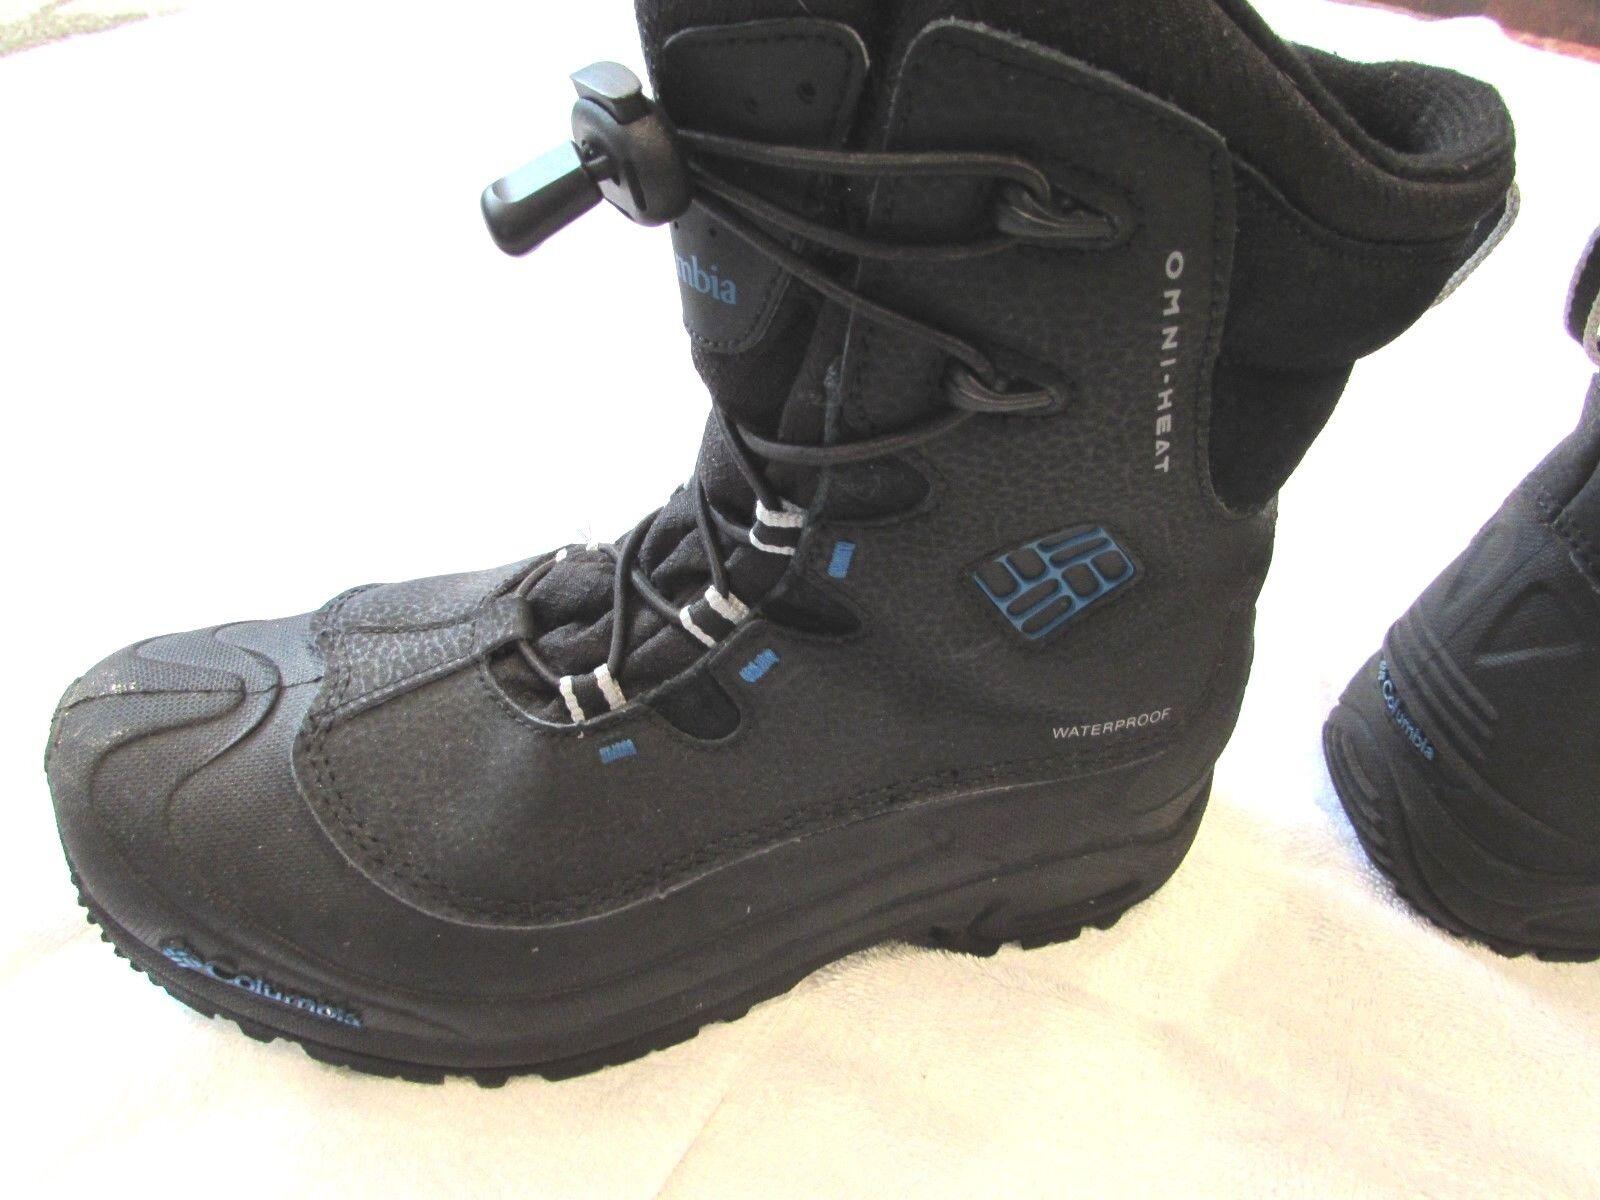 Columbia Omni-Heat Men's Hiking Boots Outdoor Waterproof Black Size 7 Pre-Owned